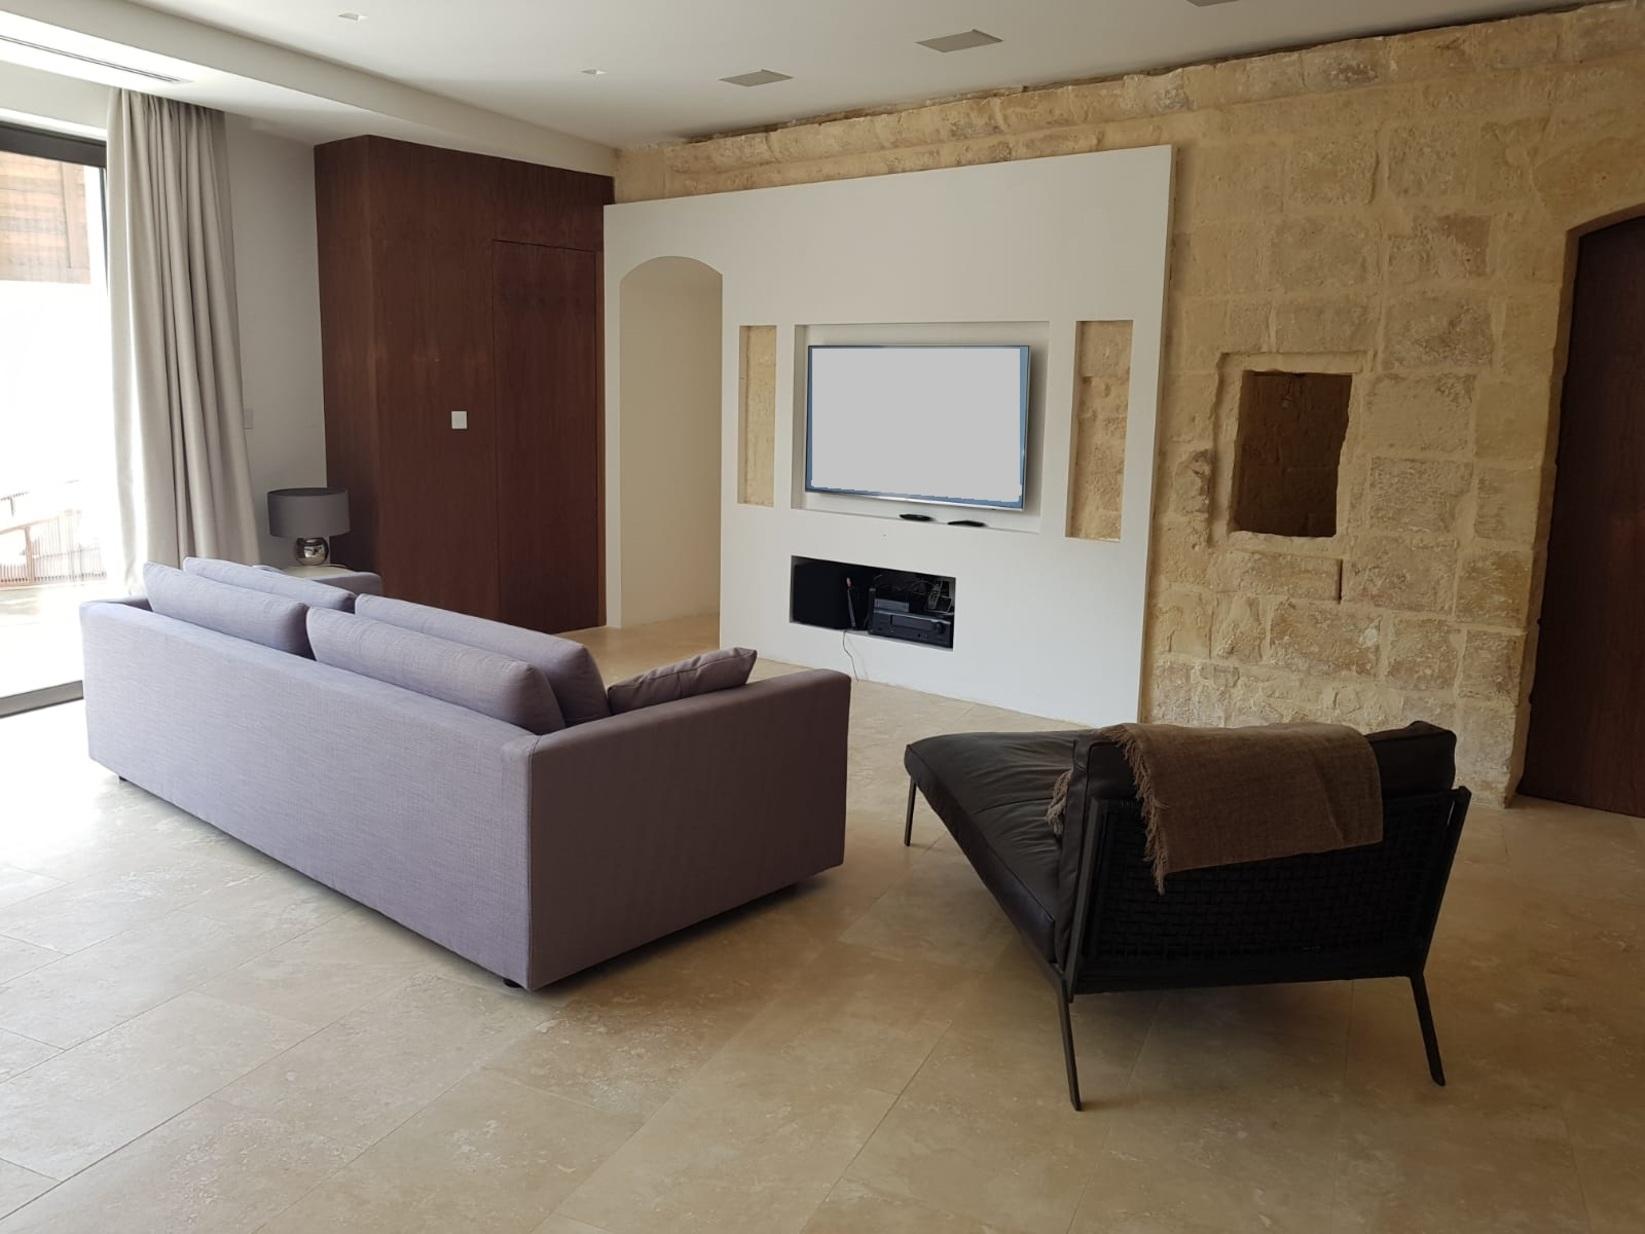 4 bed Villa For Sale in Gharghur, Gharghur - thumb 2